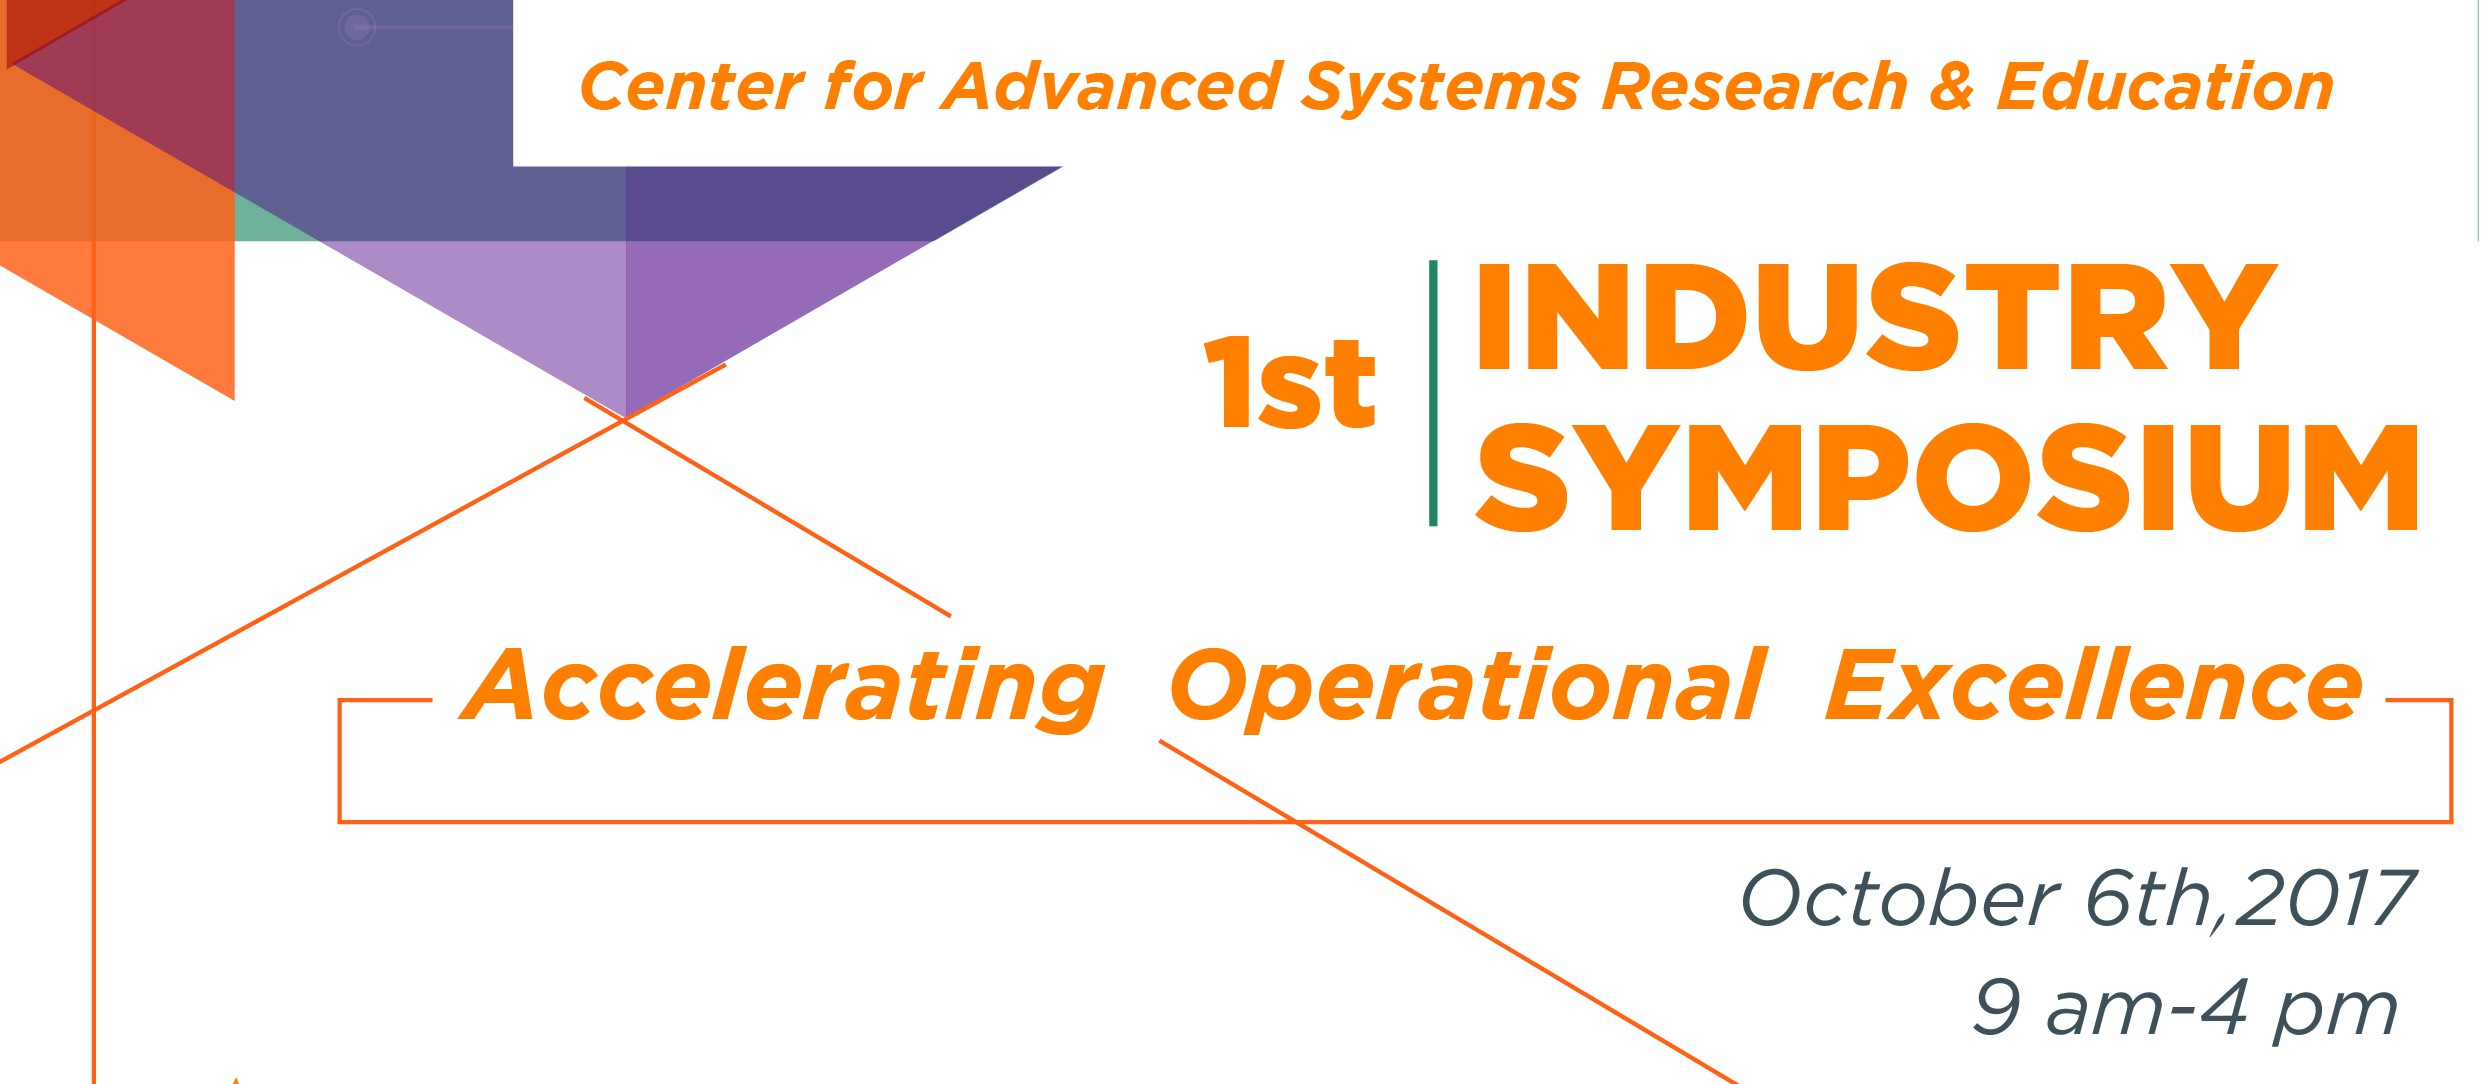 Industry Symposium